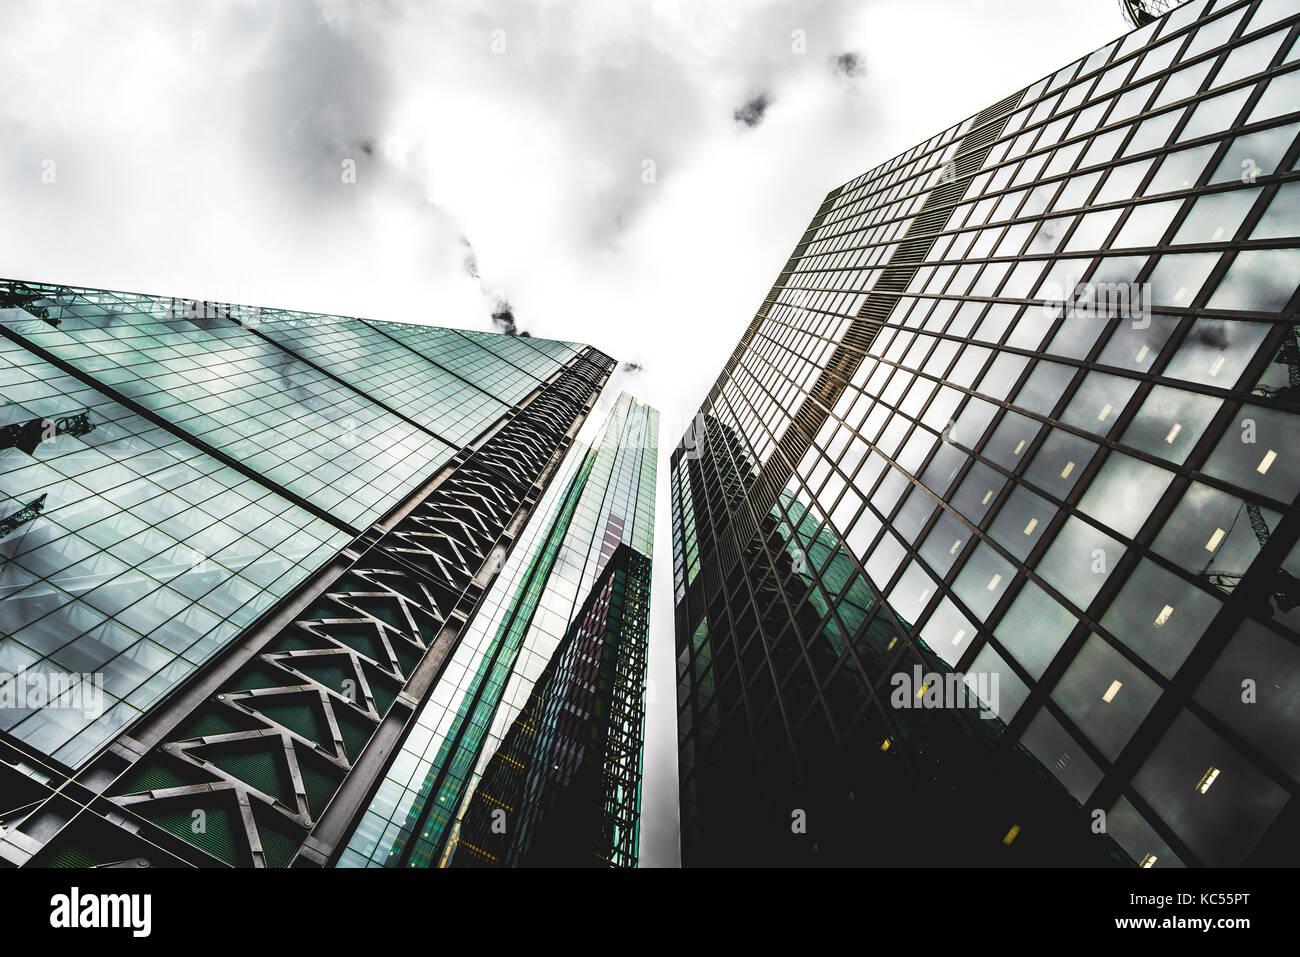 Leadenhall Market Building, City of London, London, England, United Kingdom - Stock Image